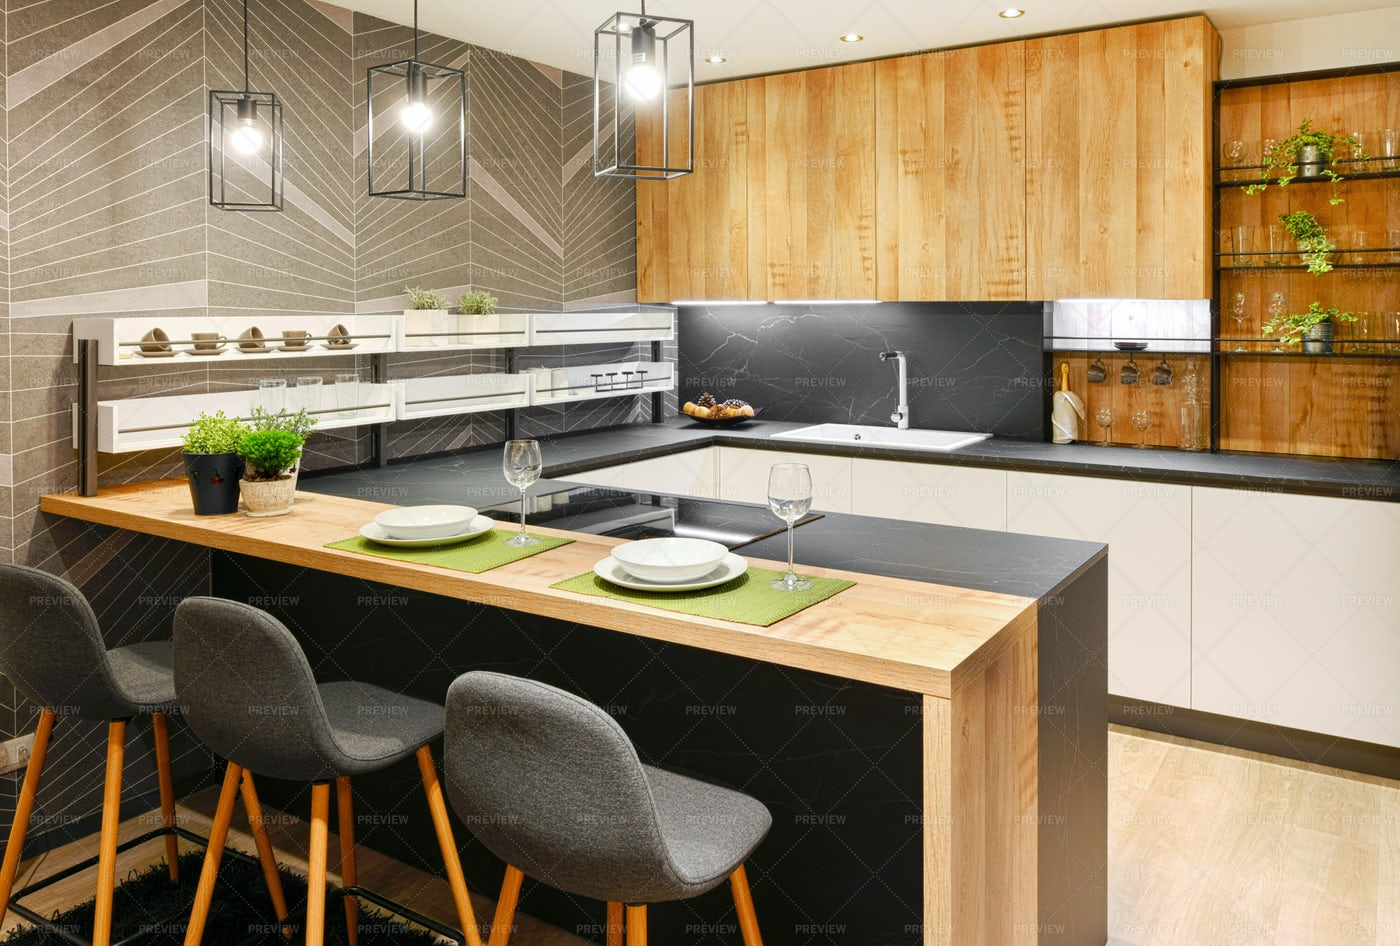 Modern Fitted Kitchen Interior: Stock Photos